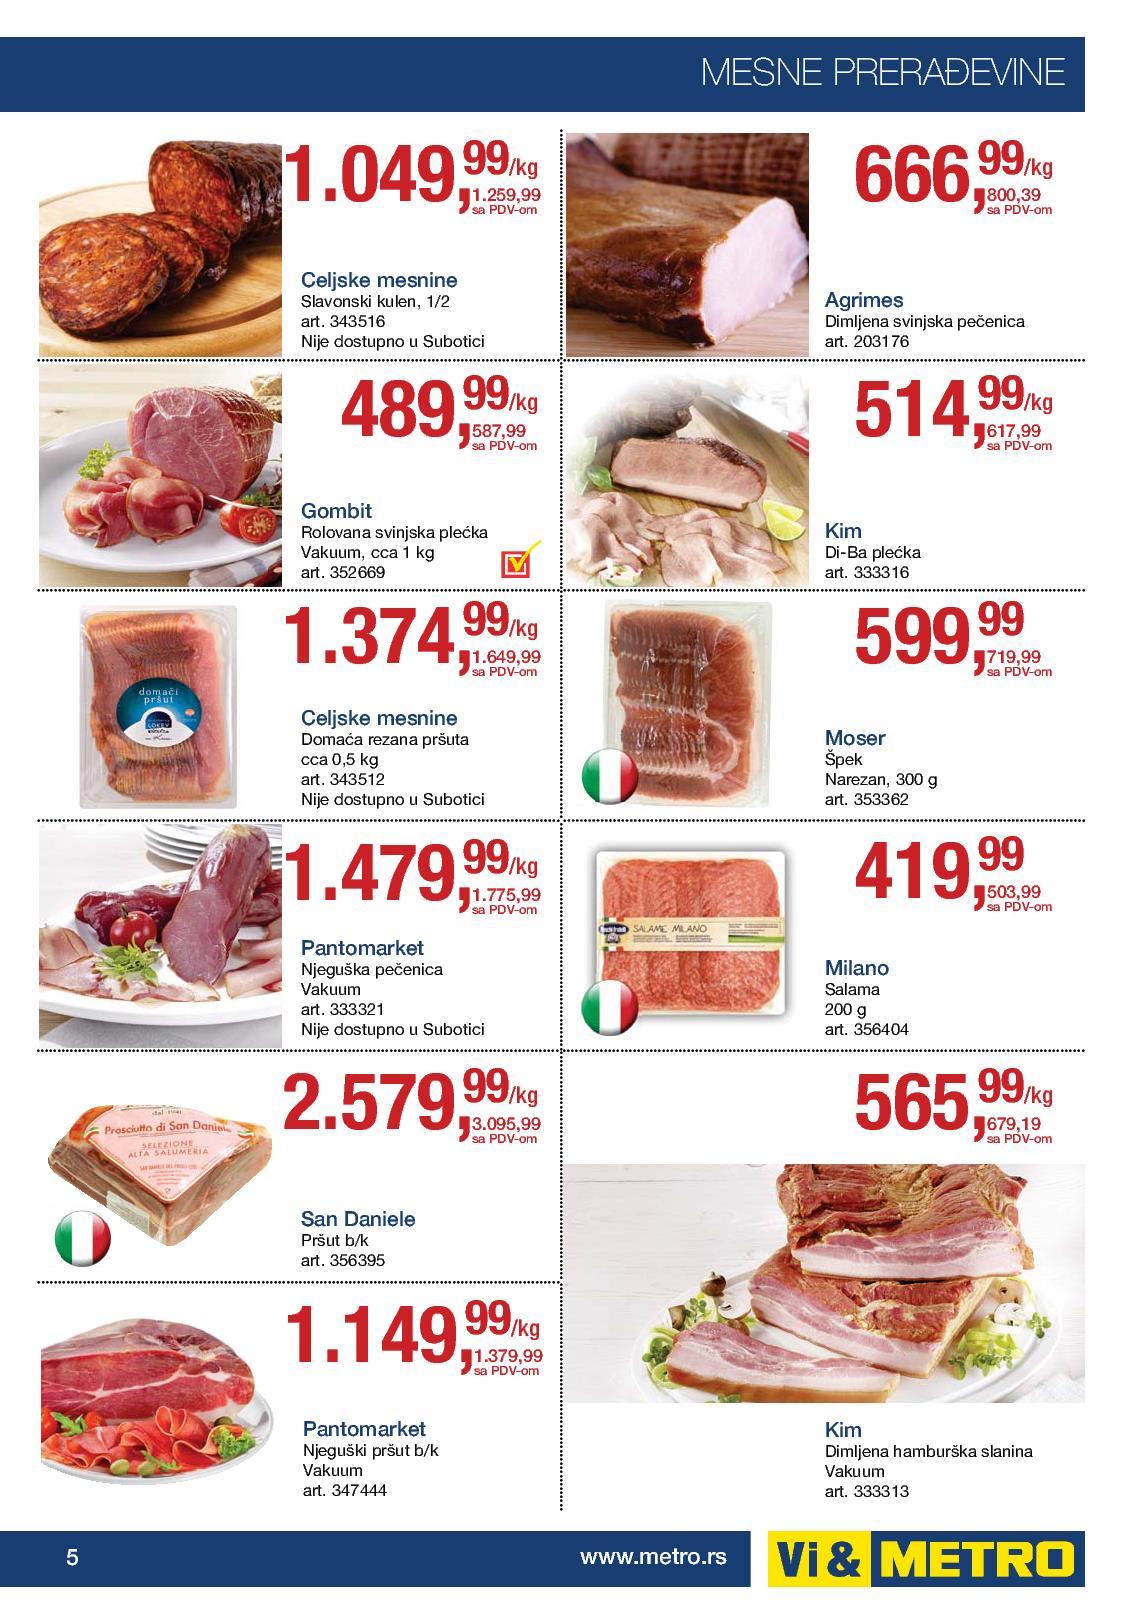 Metro akcija odlična cena prehrane za vas